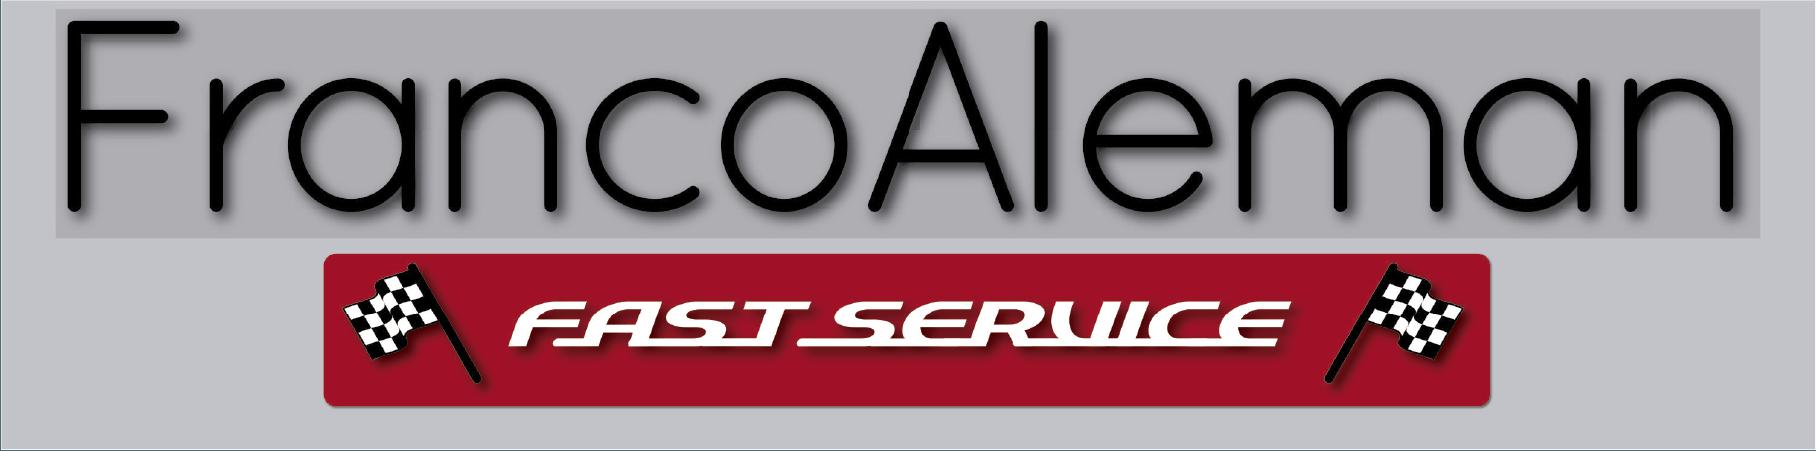 logos-clientes-FrancoAleman